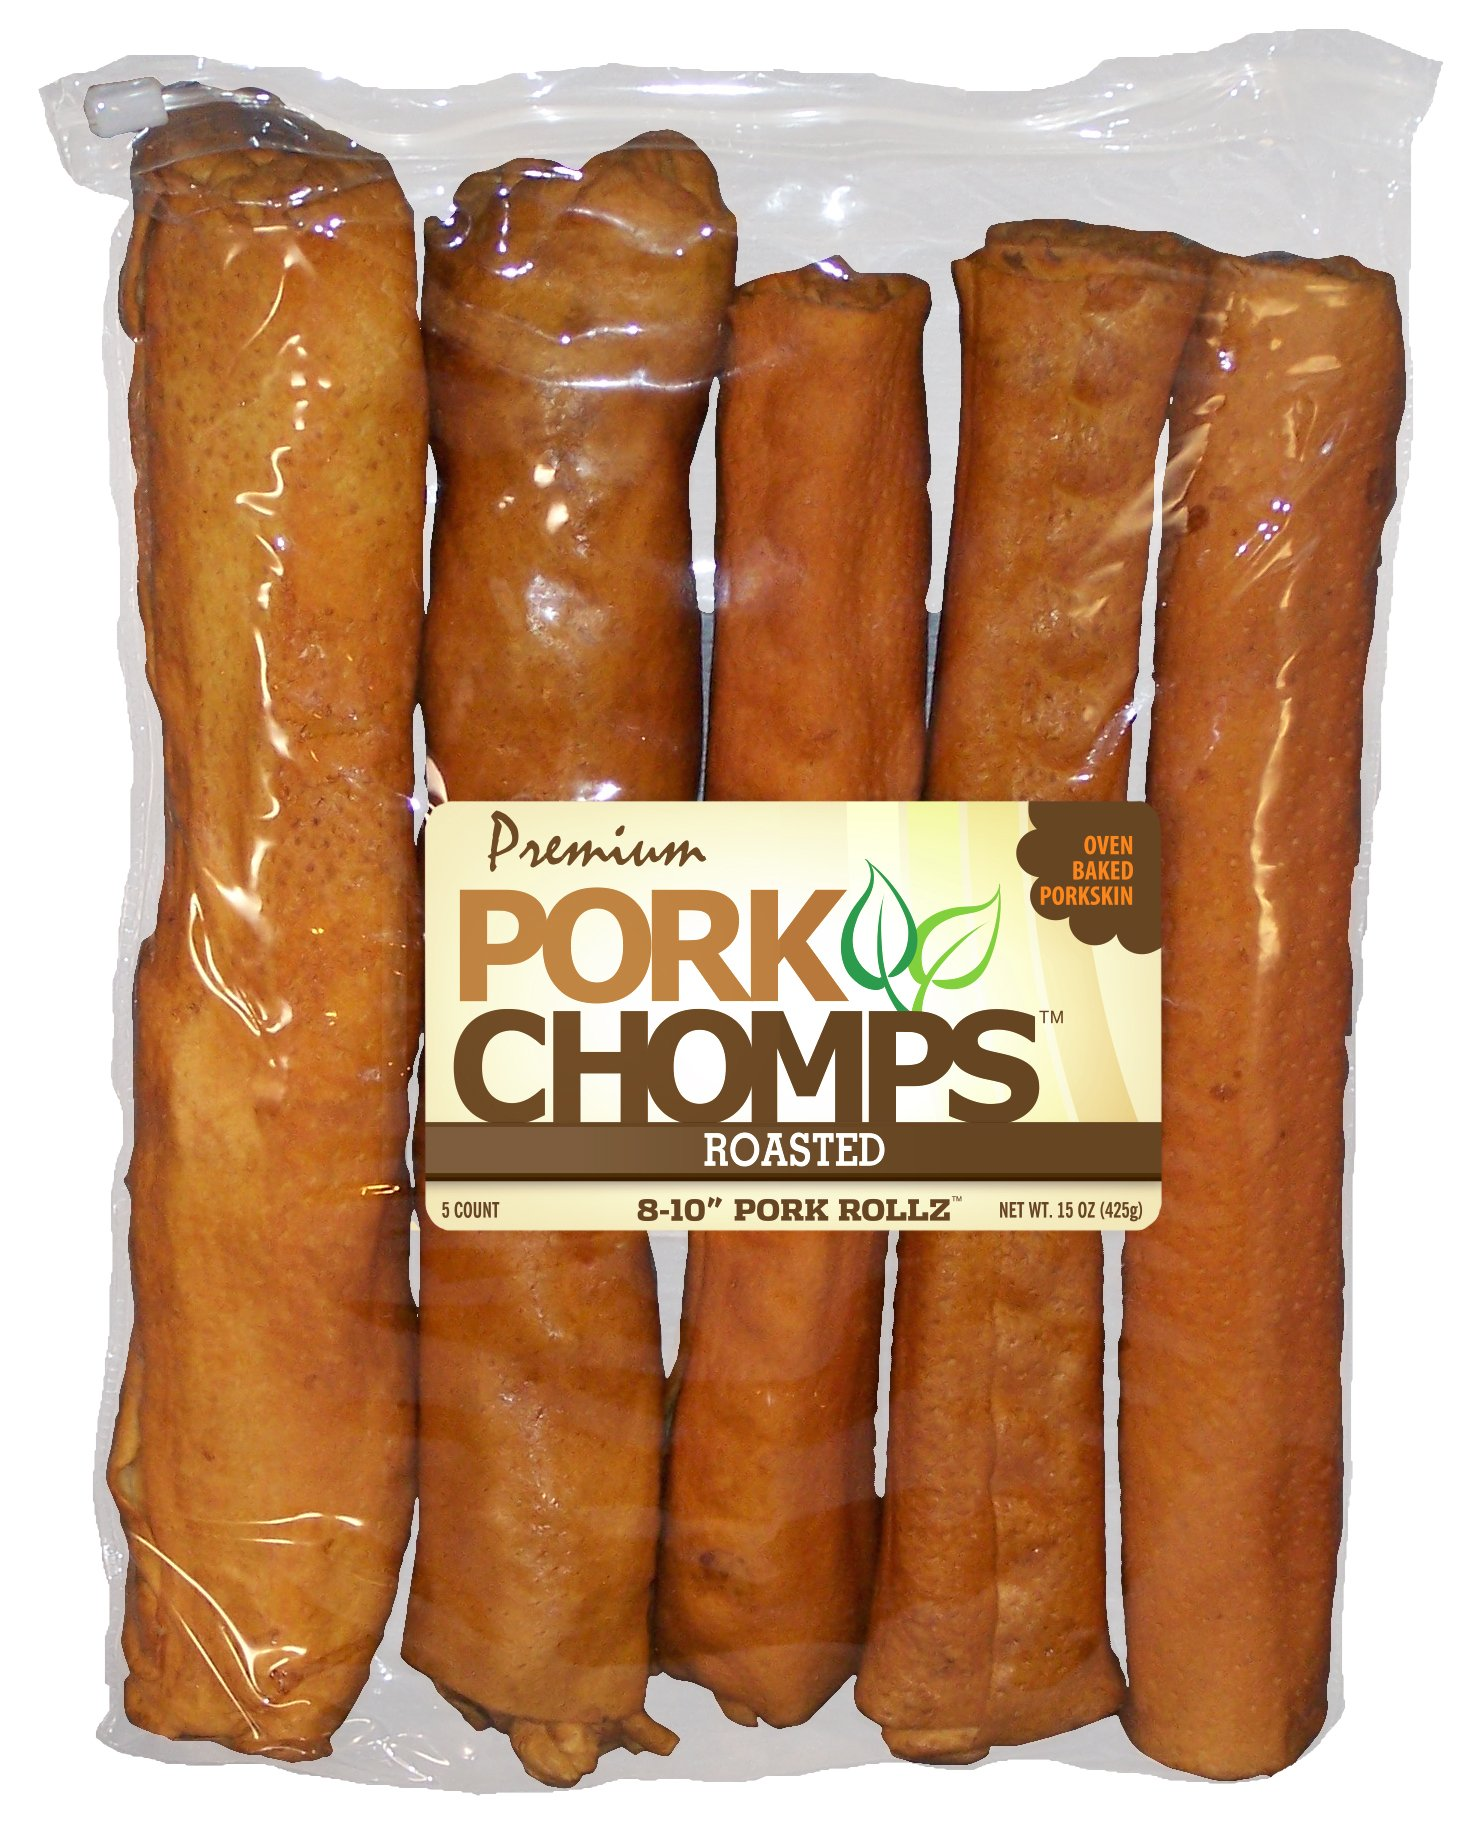 Scott Pet Products 5 Count Pork Chomps Roasted Rollz Treat, 8-10''